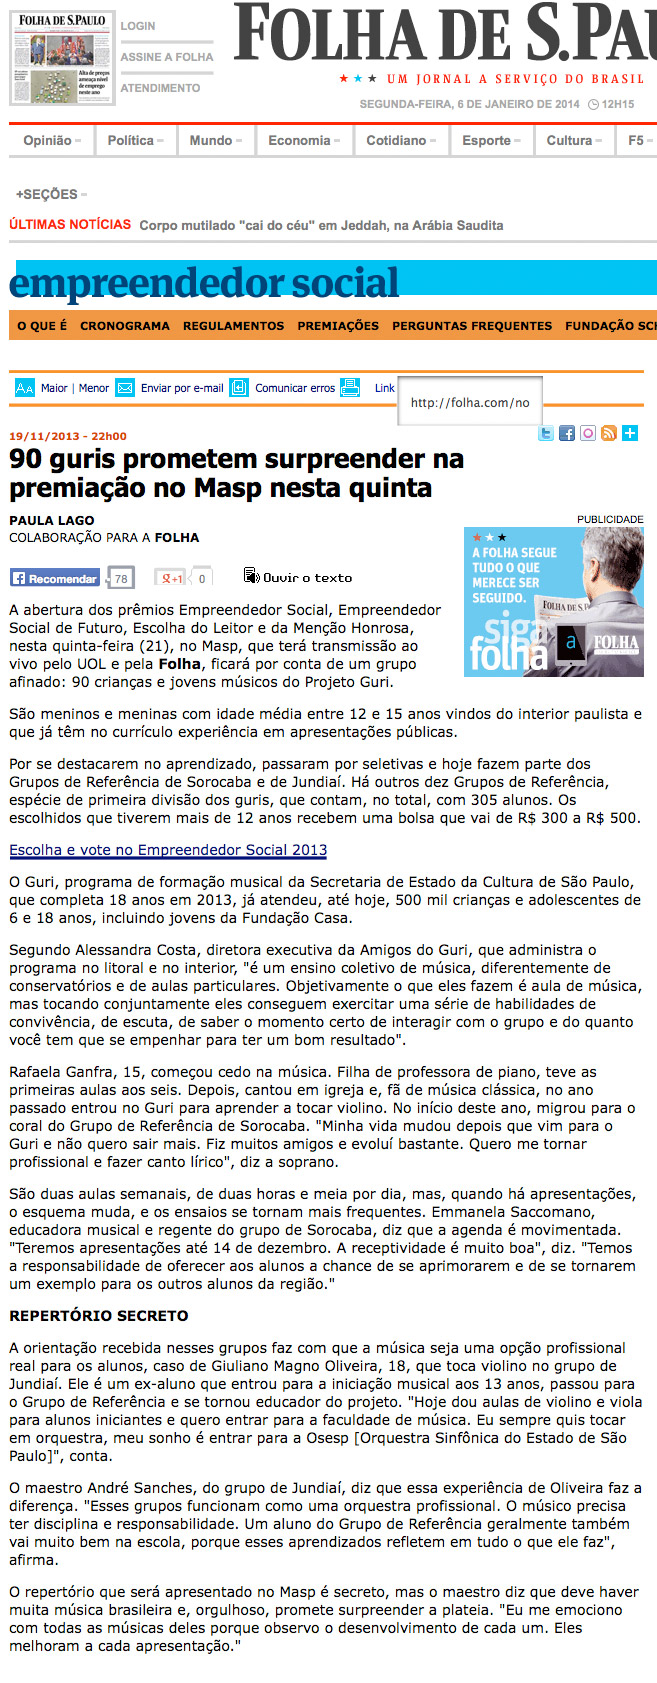 folha_empreendedor